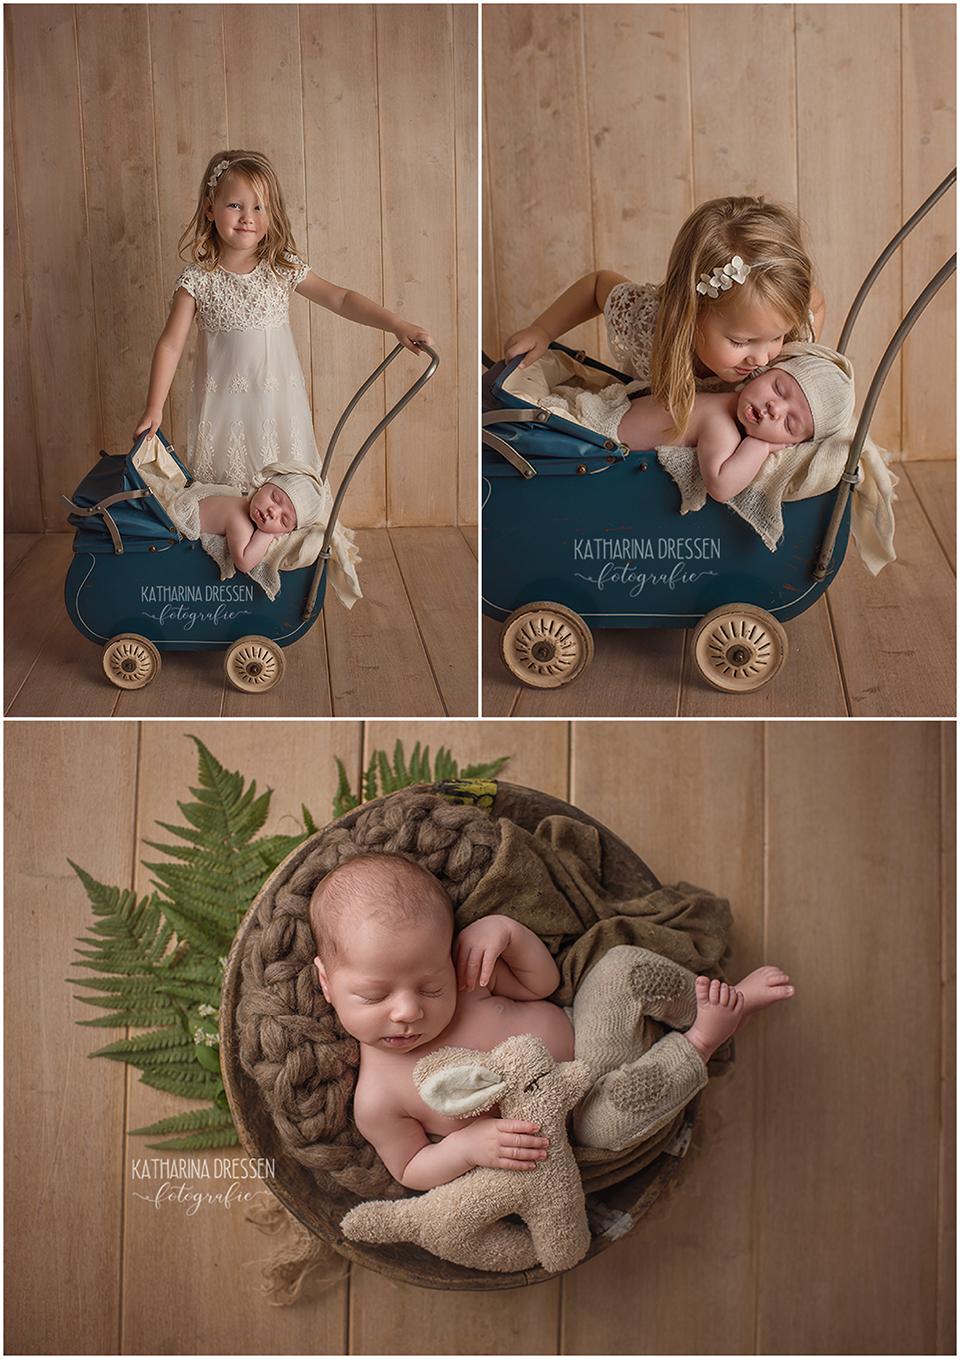 Baby-Fotograf_Newborn_Babyfotografie_Katharina-Dressen_Neugeboren-Fotoshooting_Hebamme_Geburtsklinik_Wehen_Geburt_Schwanger_Baby_Fotoatelier_Duesseldorf_Koeln